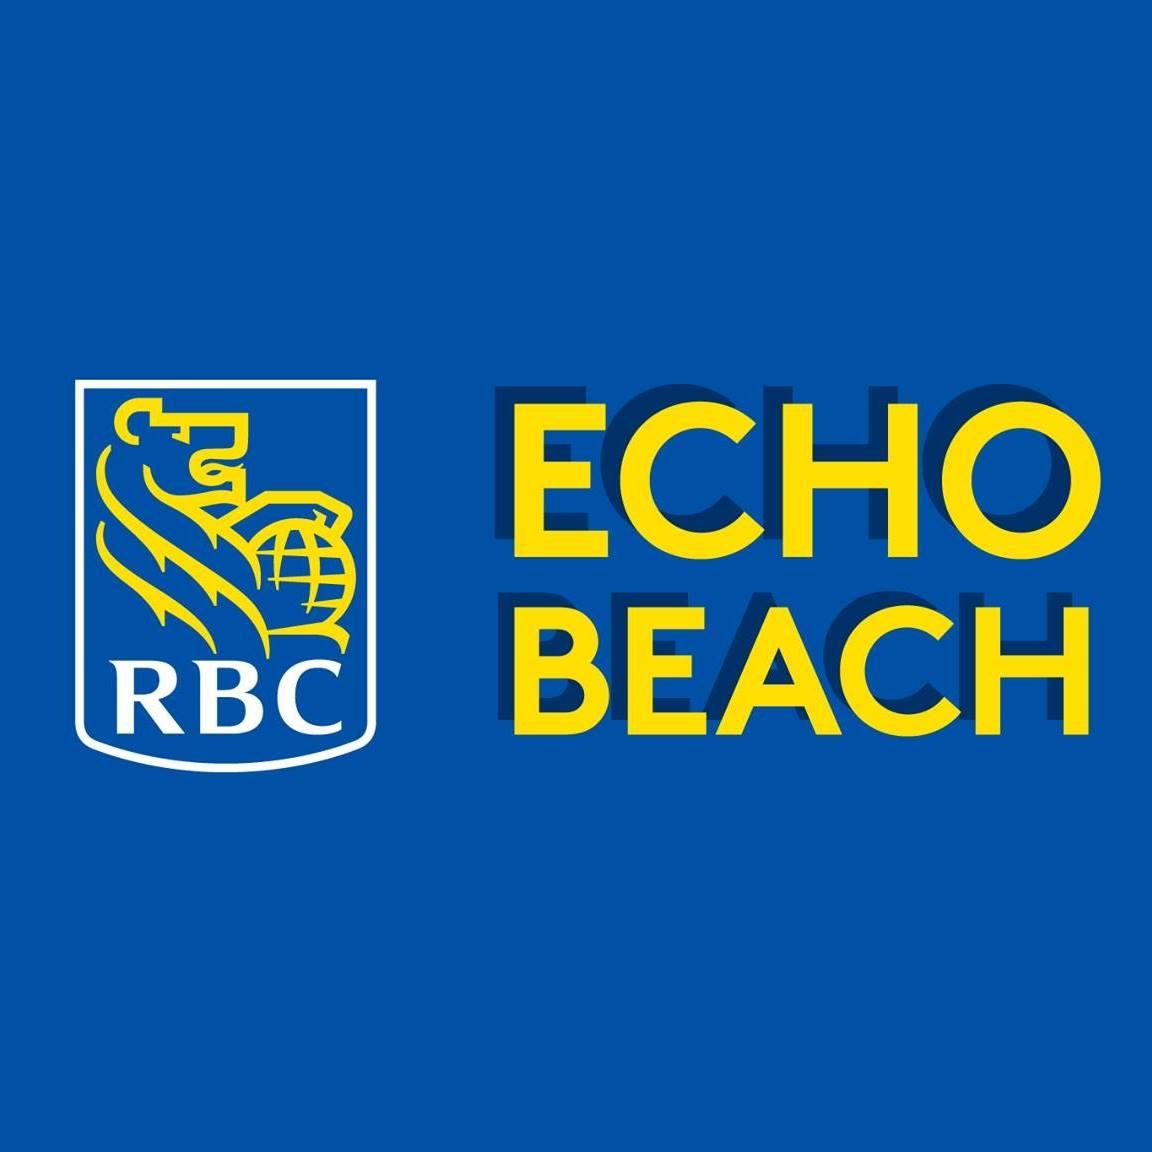 RBC Echo Beach